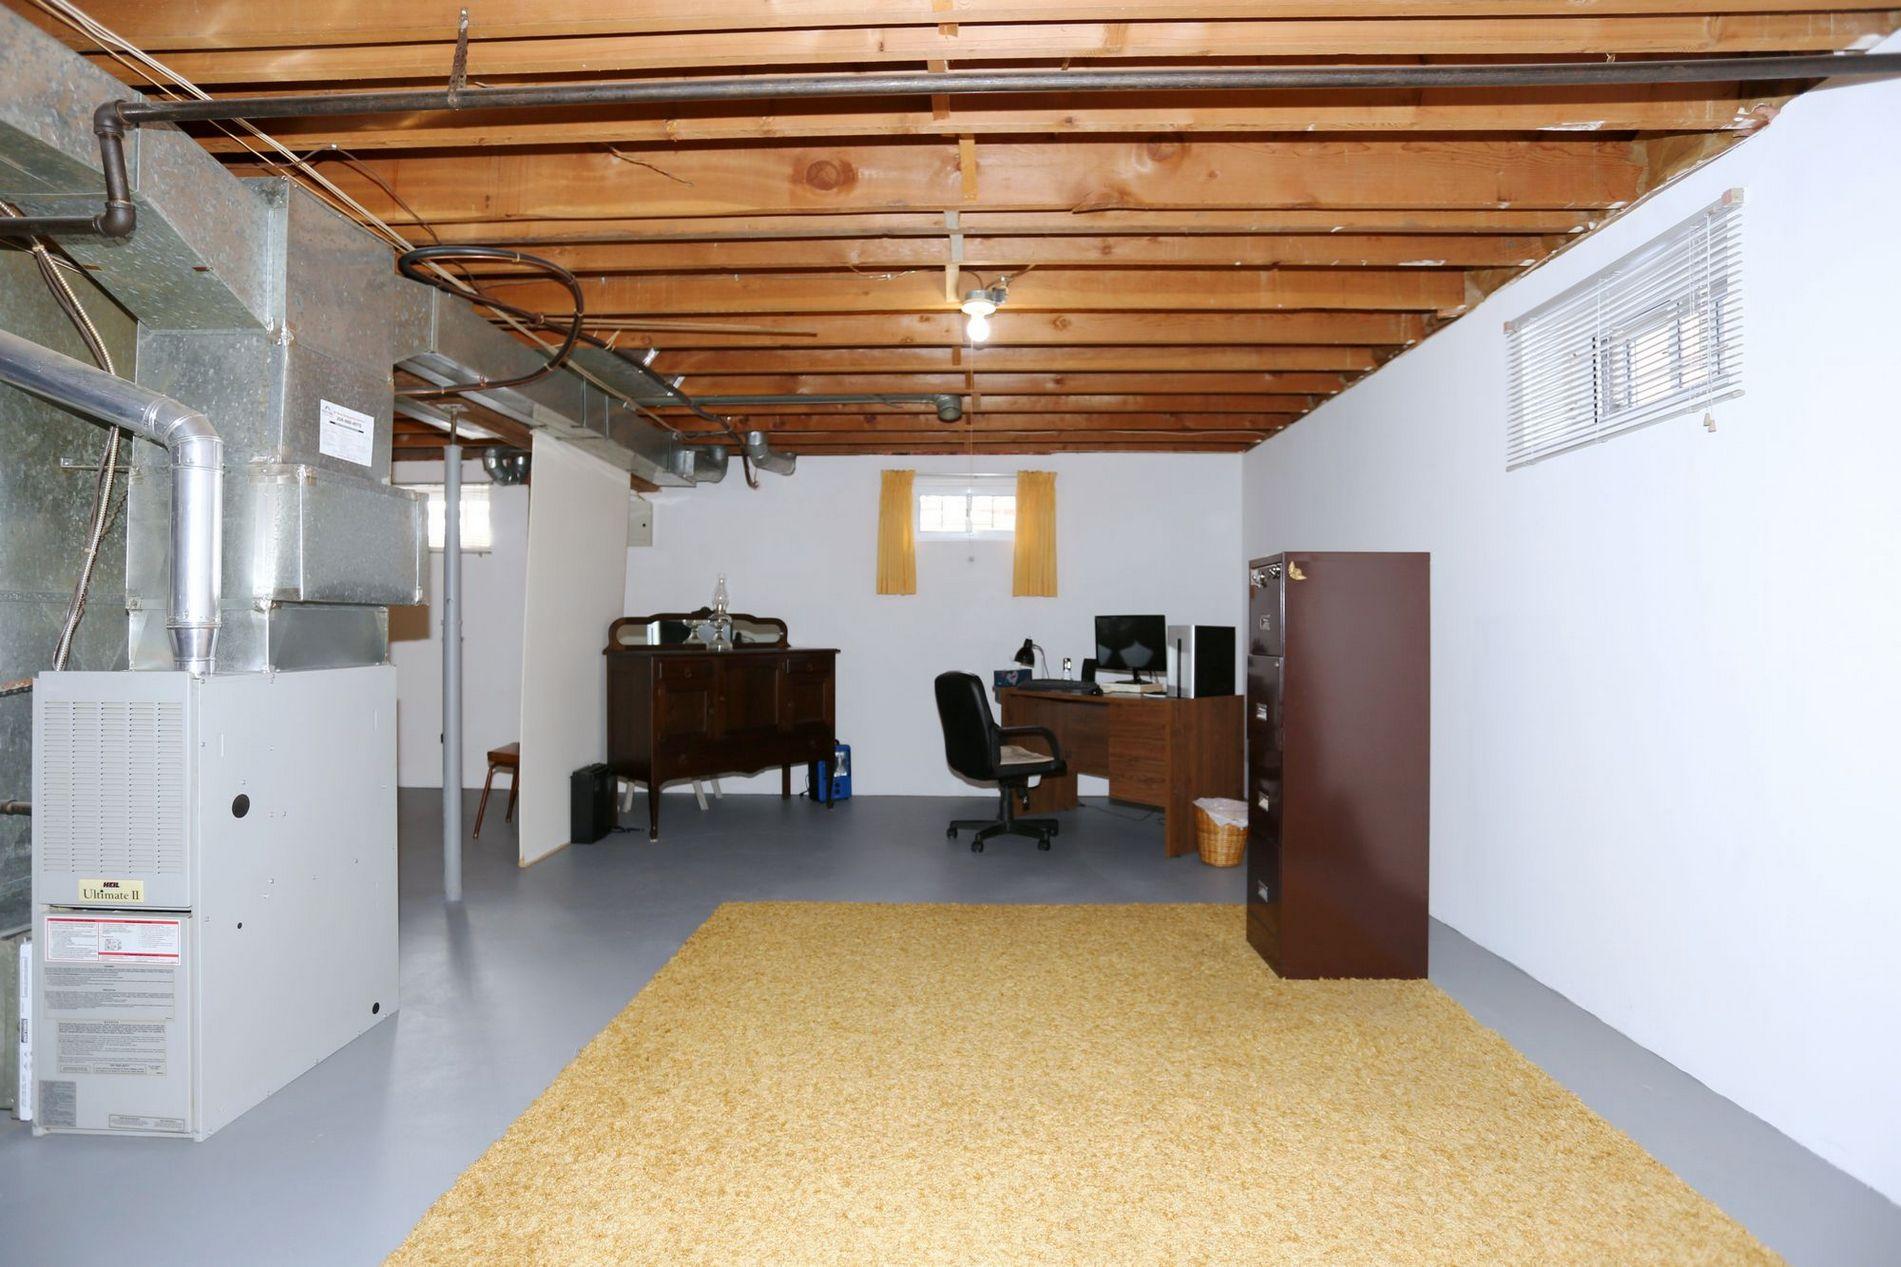 342 Woodbine Avenue, Winnipeg, Manitoba  R2V 4H4 - Photo 16 - 1703630